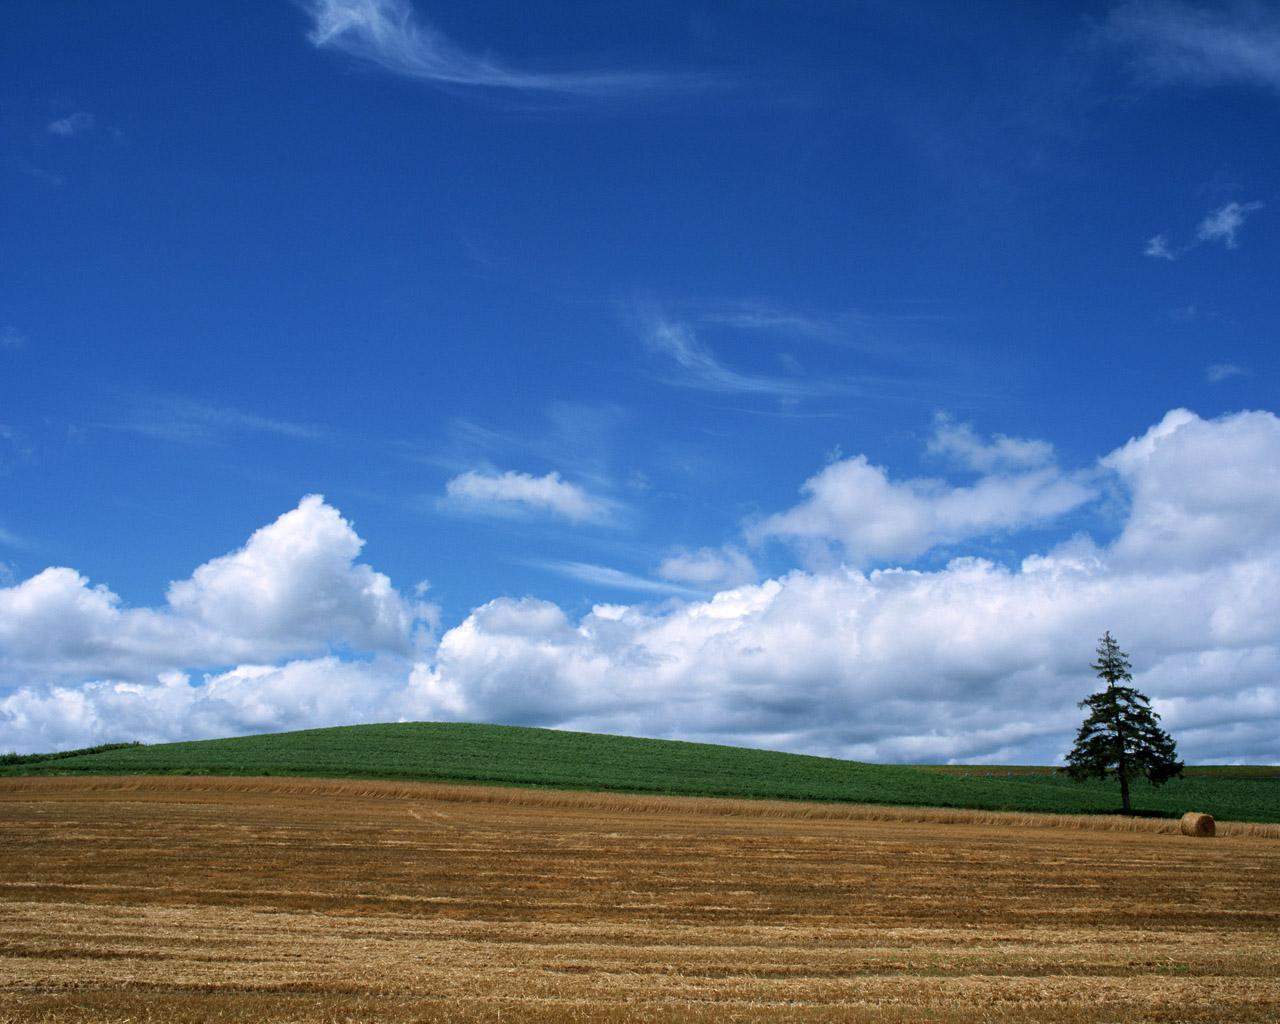 Blue sky clouds wallpaper blue sky wallpaper blue sky clouds 1280x1024